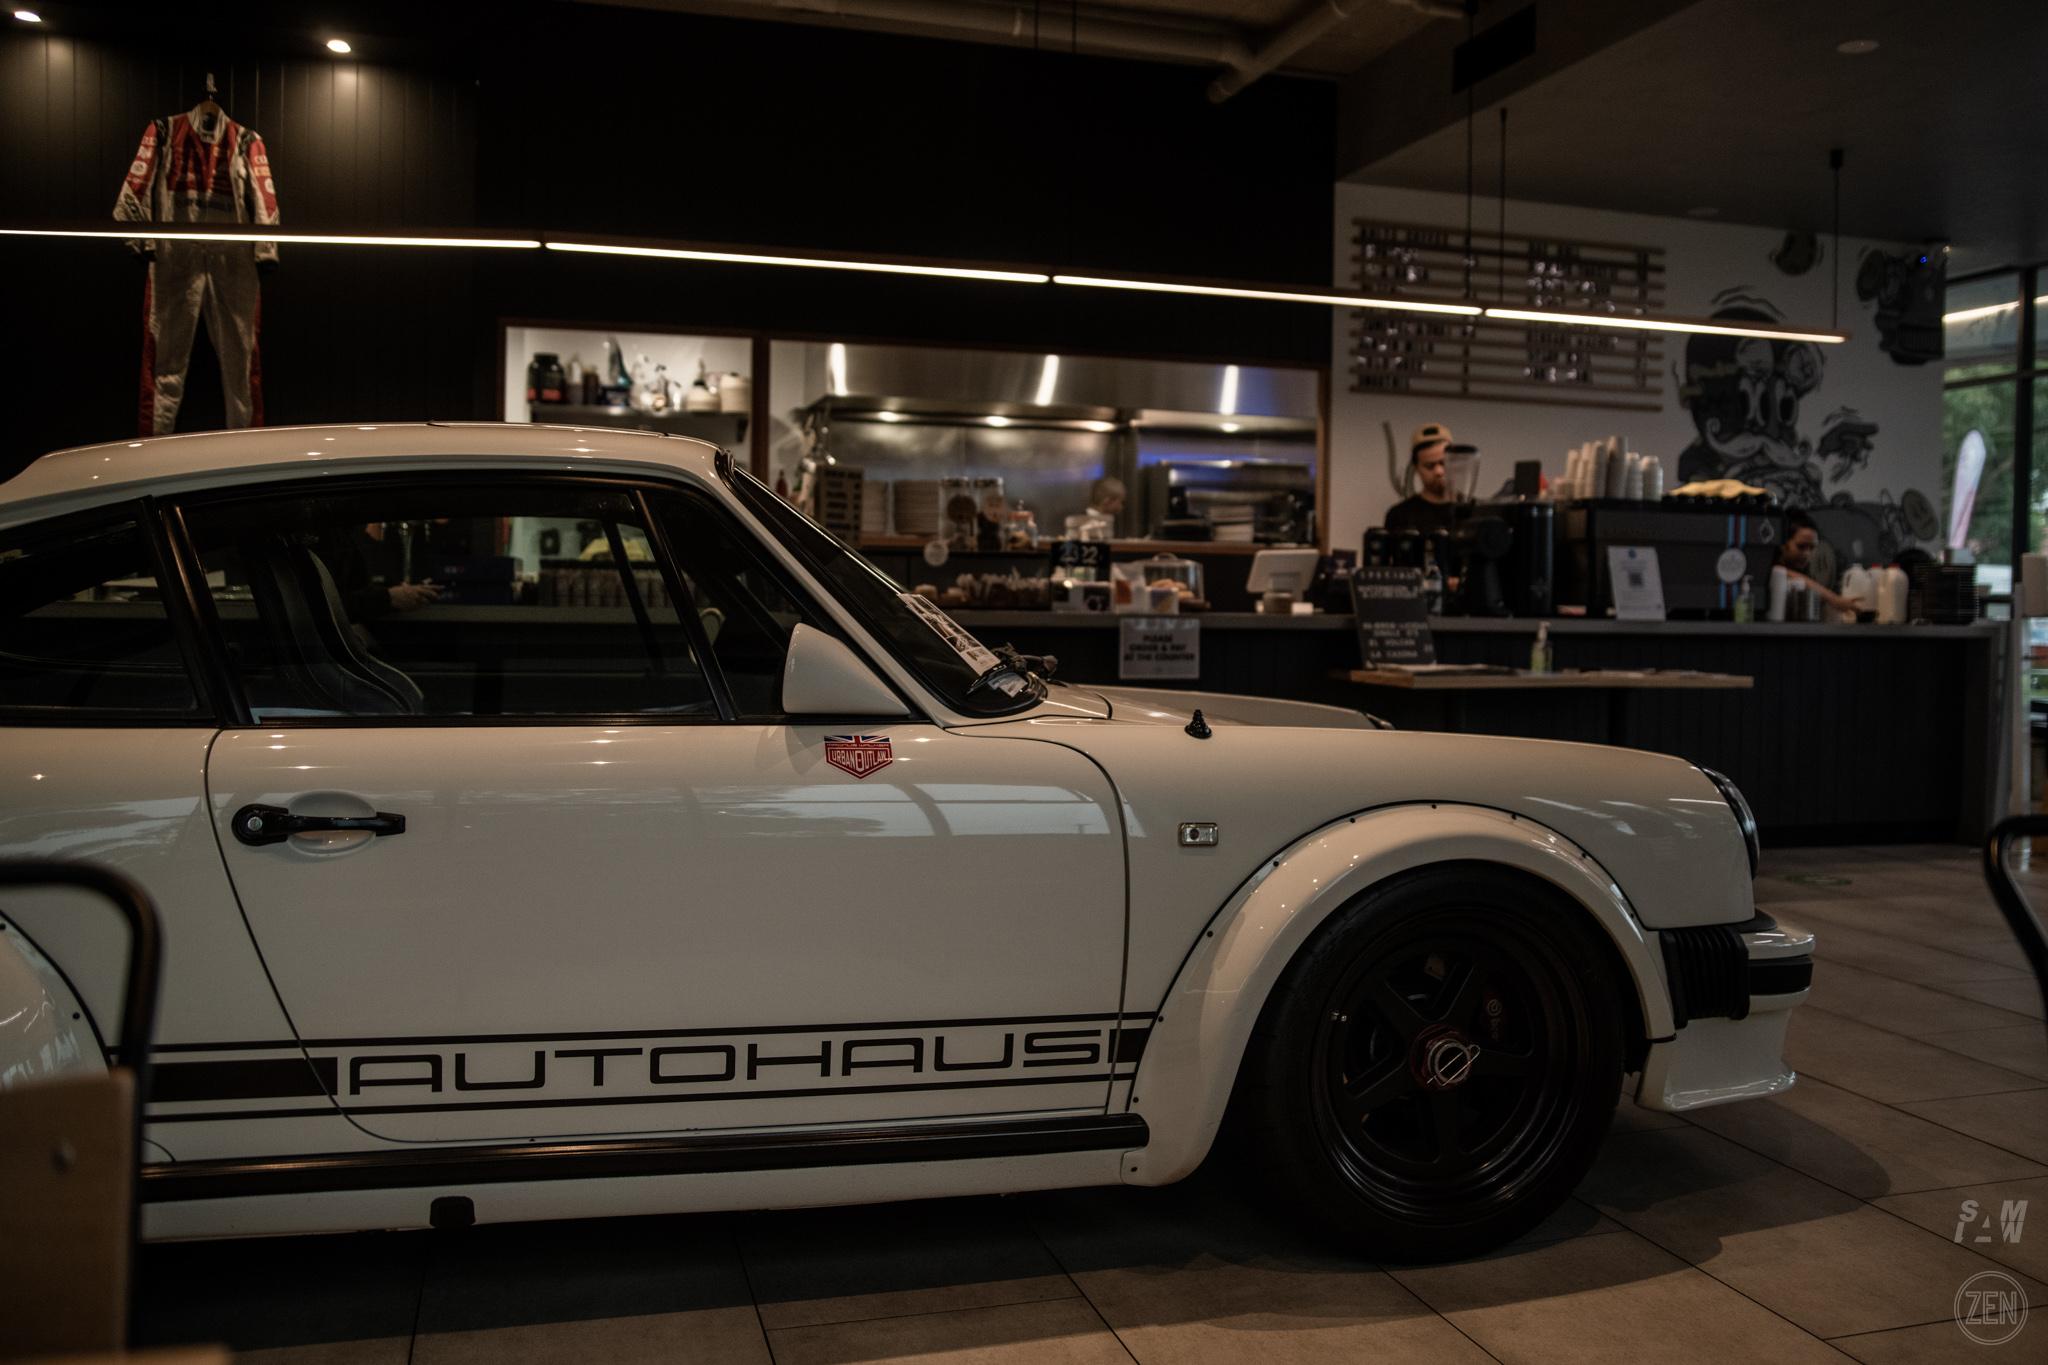 2021-02-27 - Benzin x Autohaus Grp 4 003